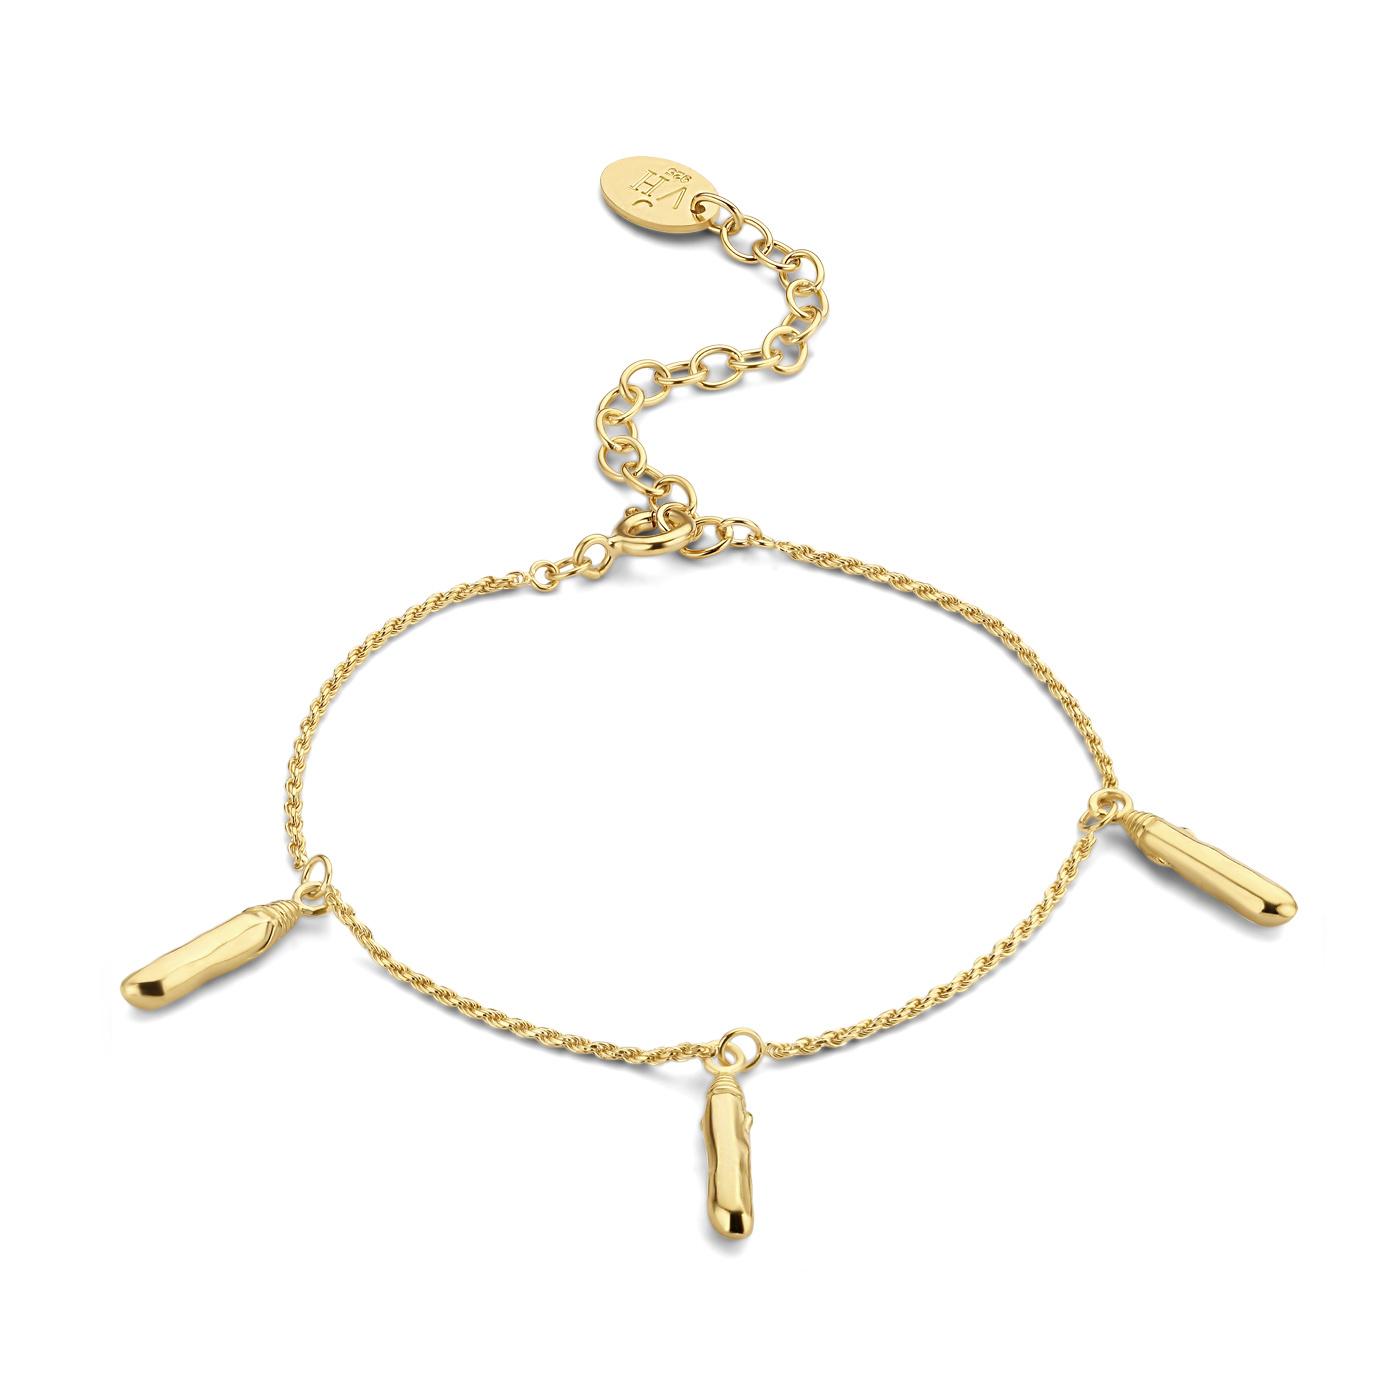 Violet Hamden Sisterhood Mona 925 Sterling Silber goldfarbenes Armband mit Stange